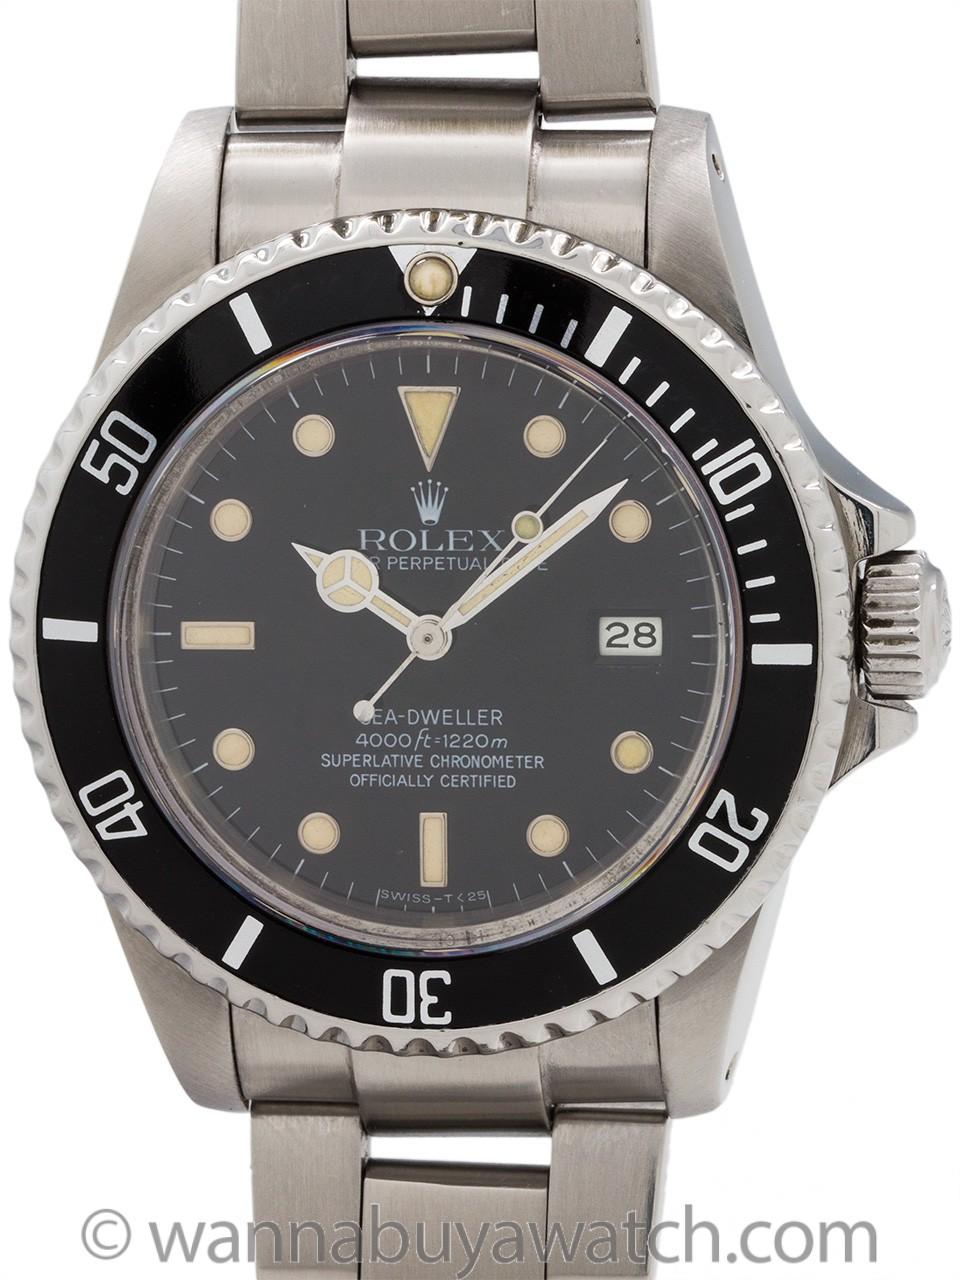 Rolex Seadweller ref 16660 Transitional circa 1984